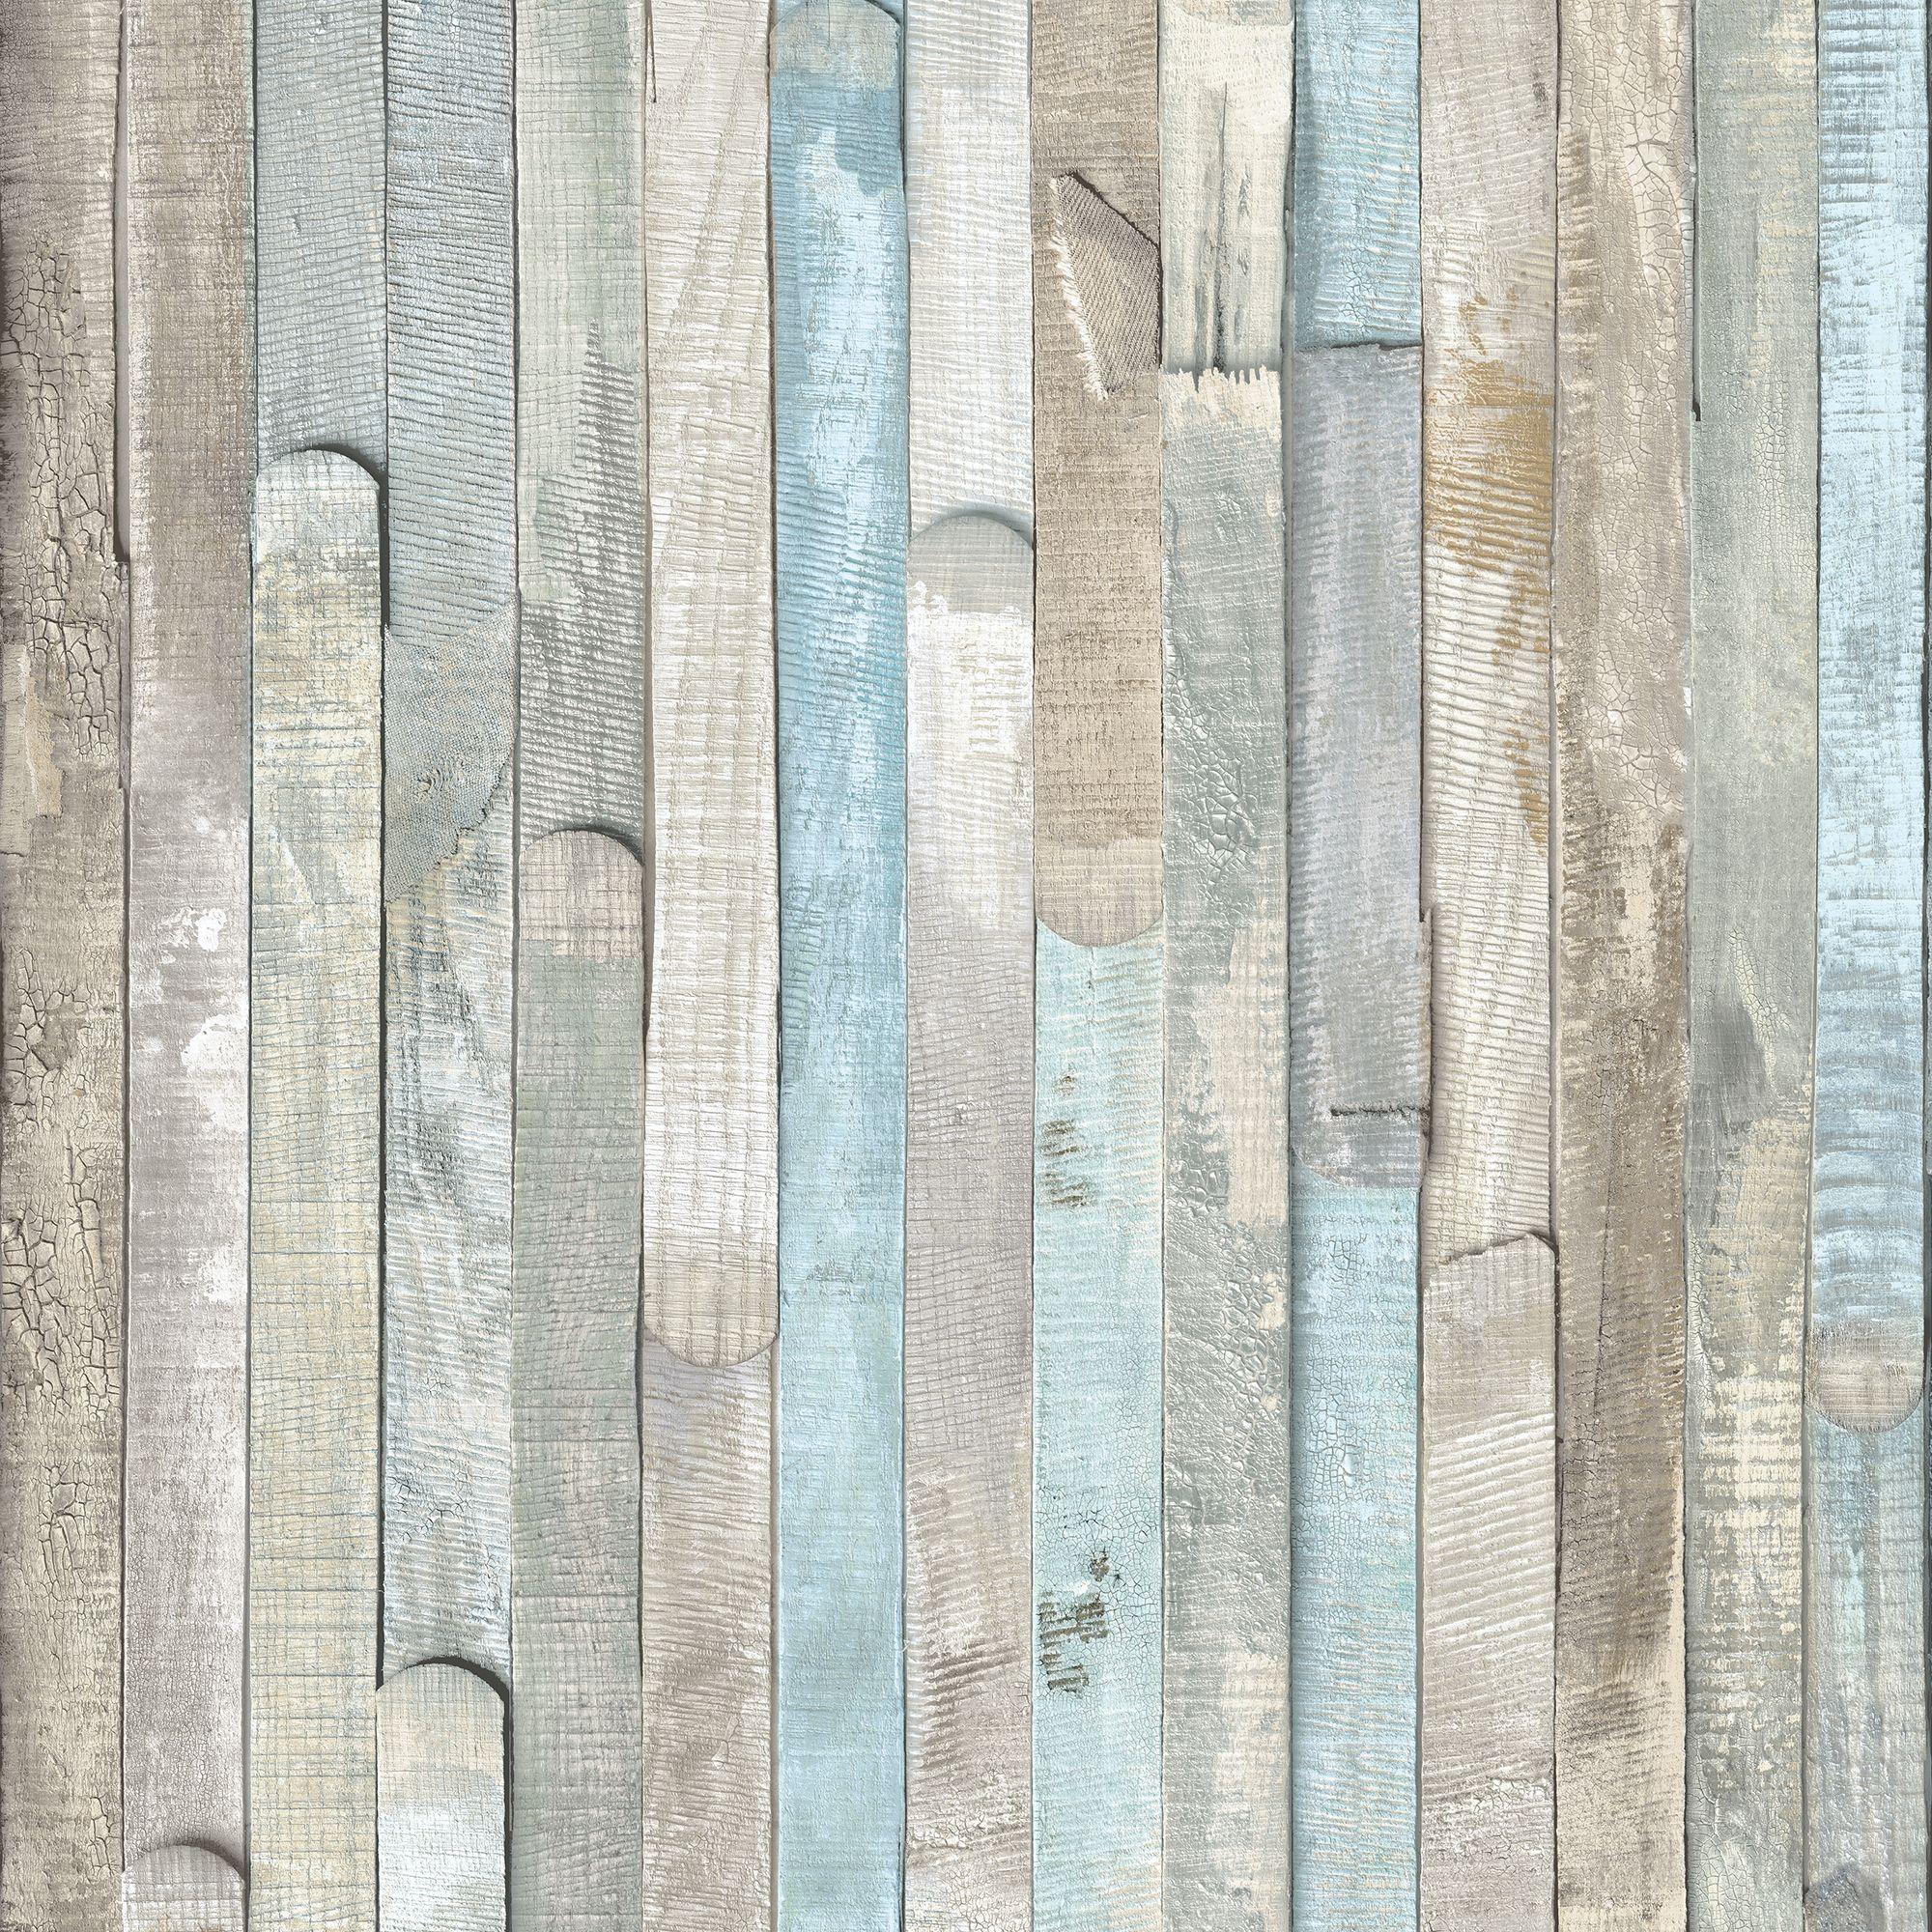 D C Fix Rio Ocean Drift Wood Grey Self Adhesive Film (L)2M